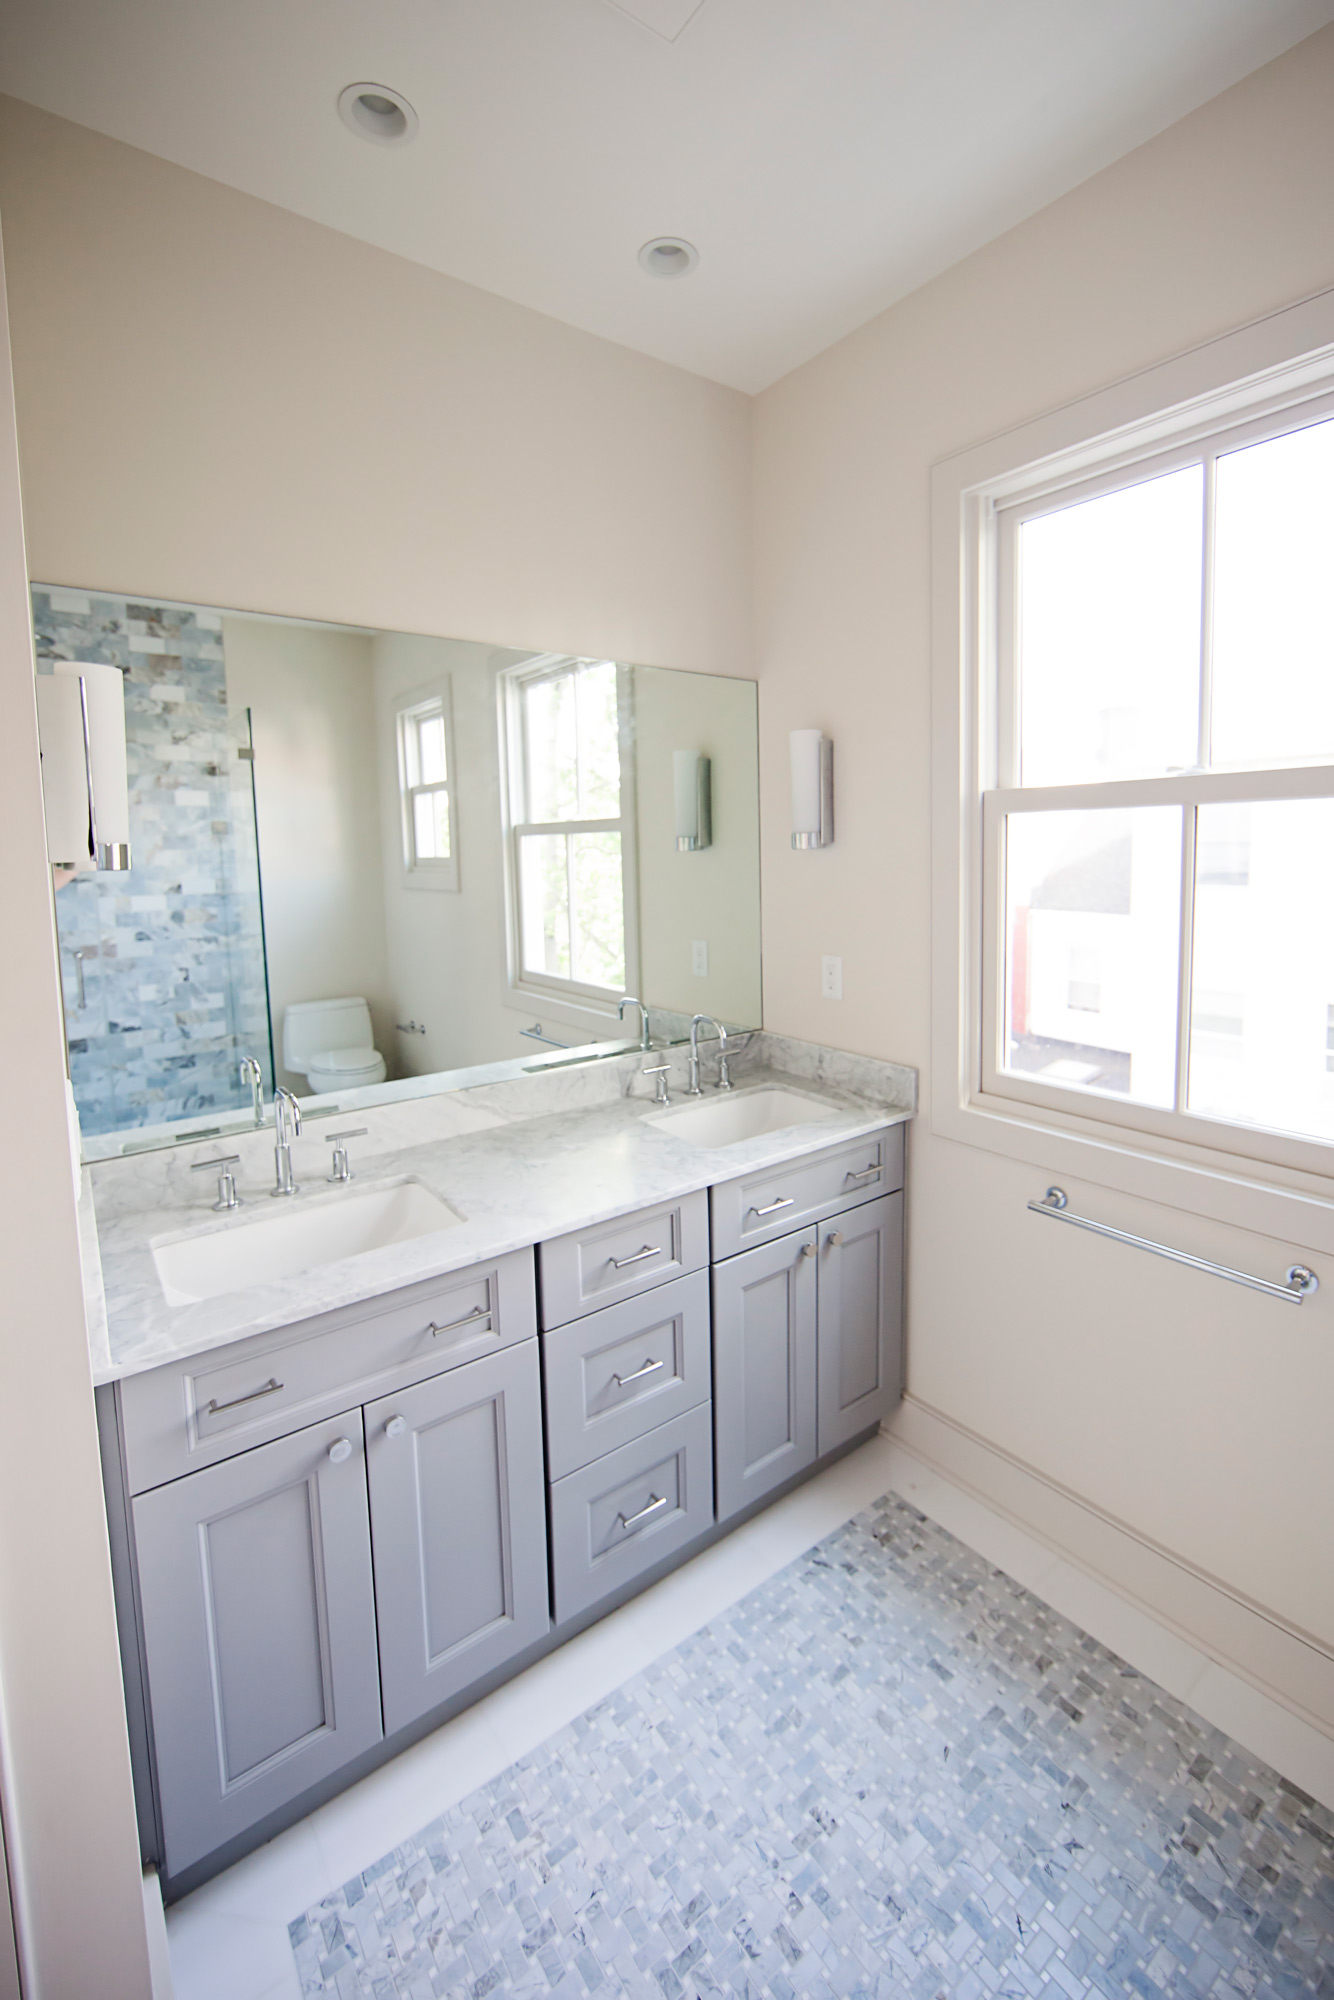 thompson-fine-home-renovations-hoboken-new-jersey-construction-9.jpg